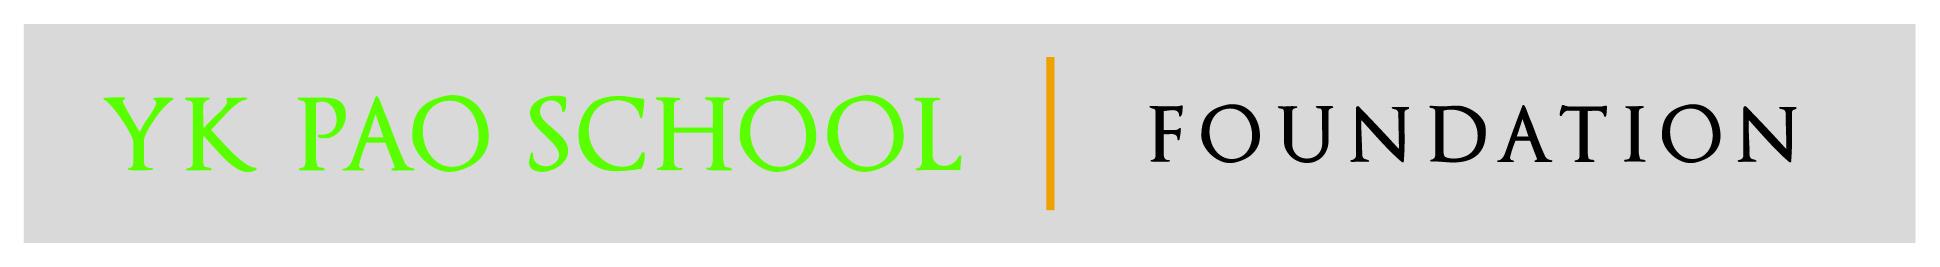 YK PAO SCHOOL FOUNDATION